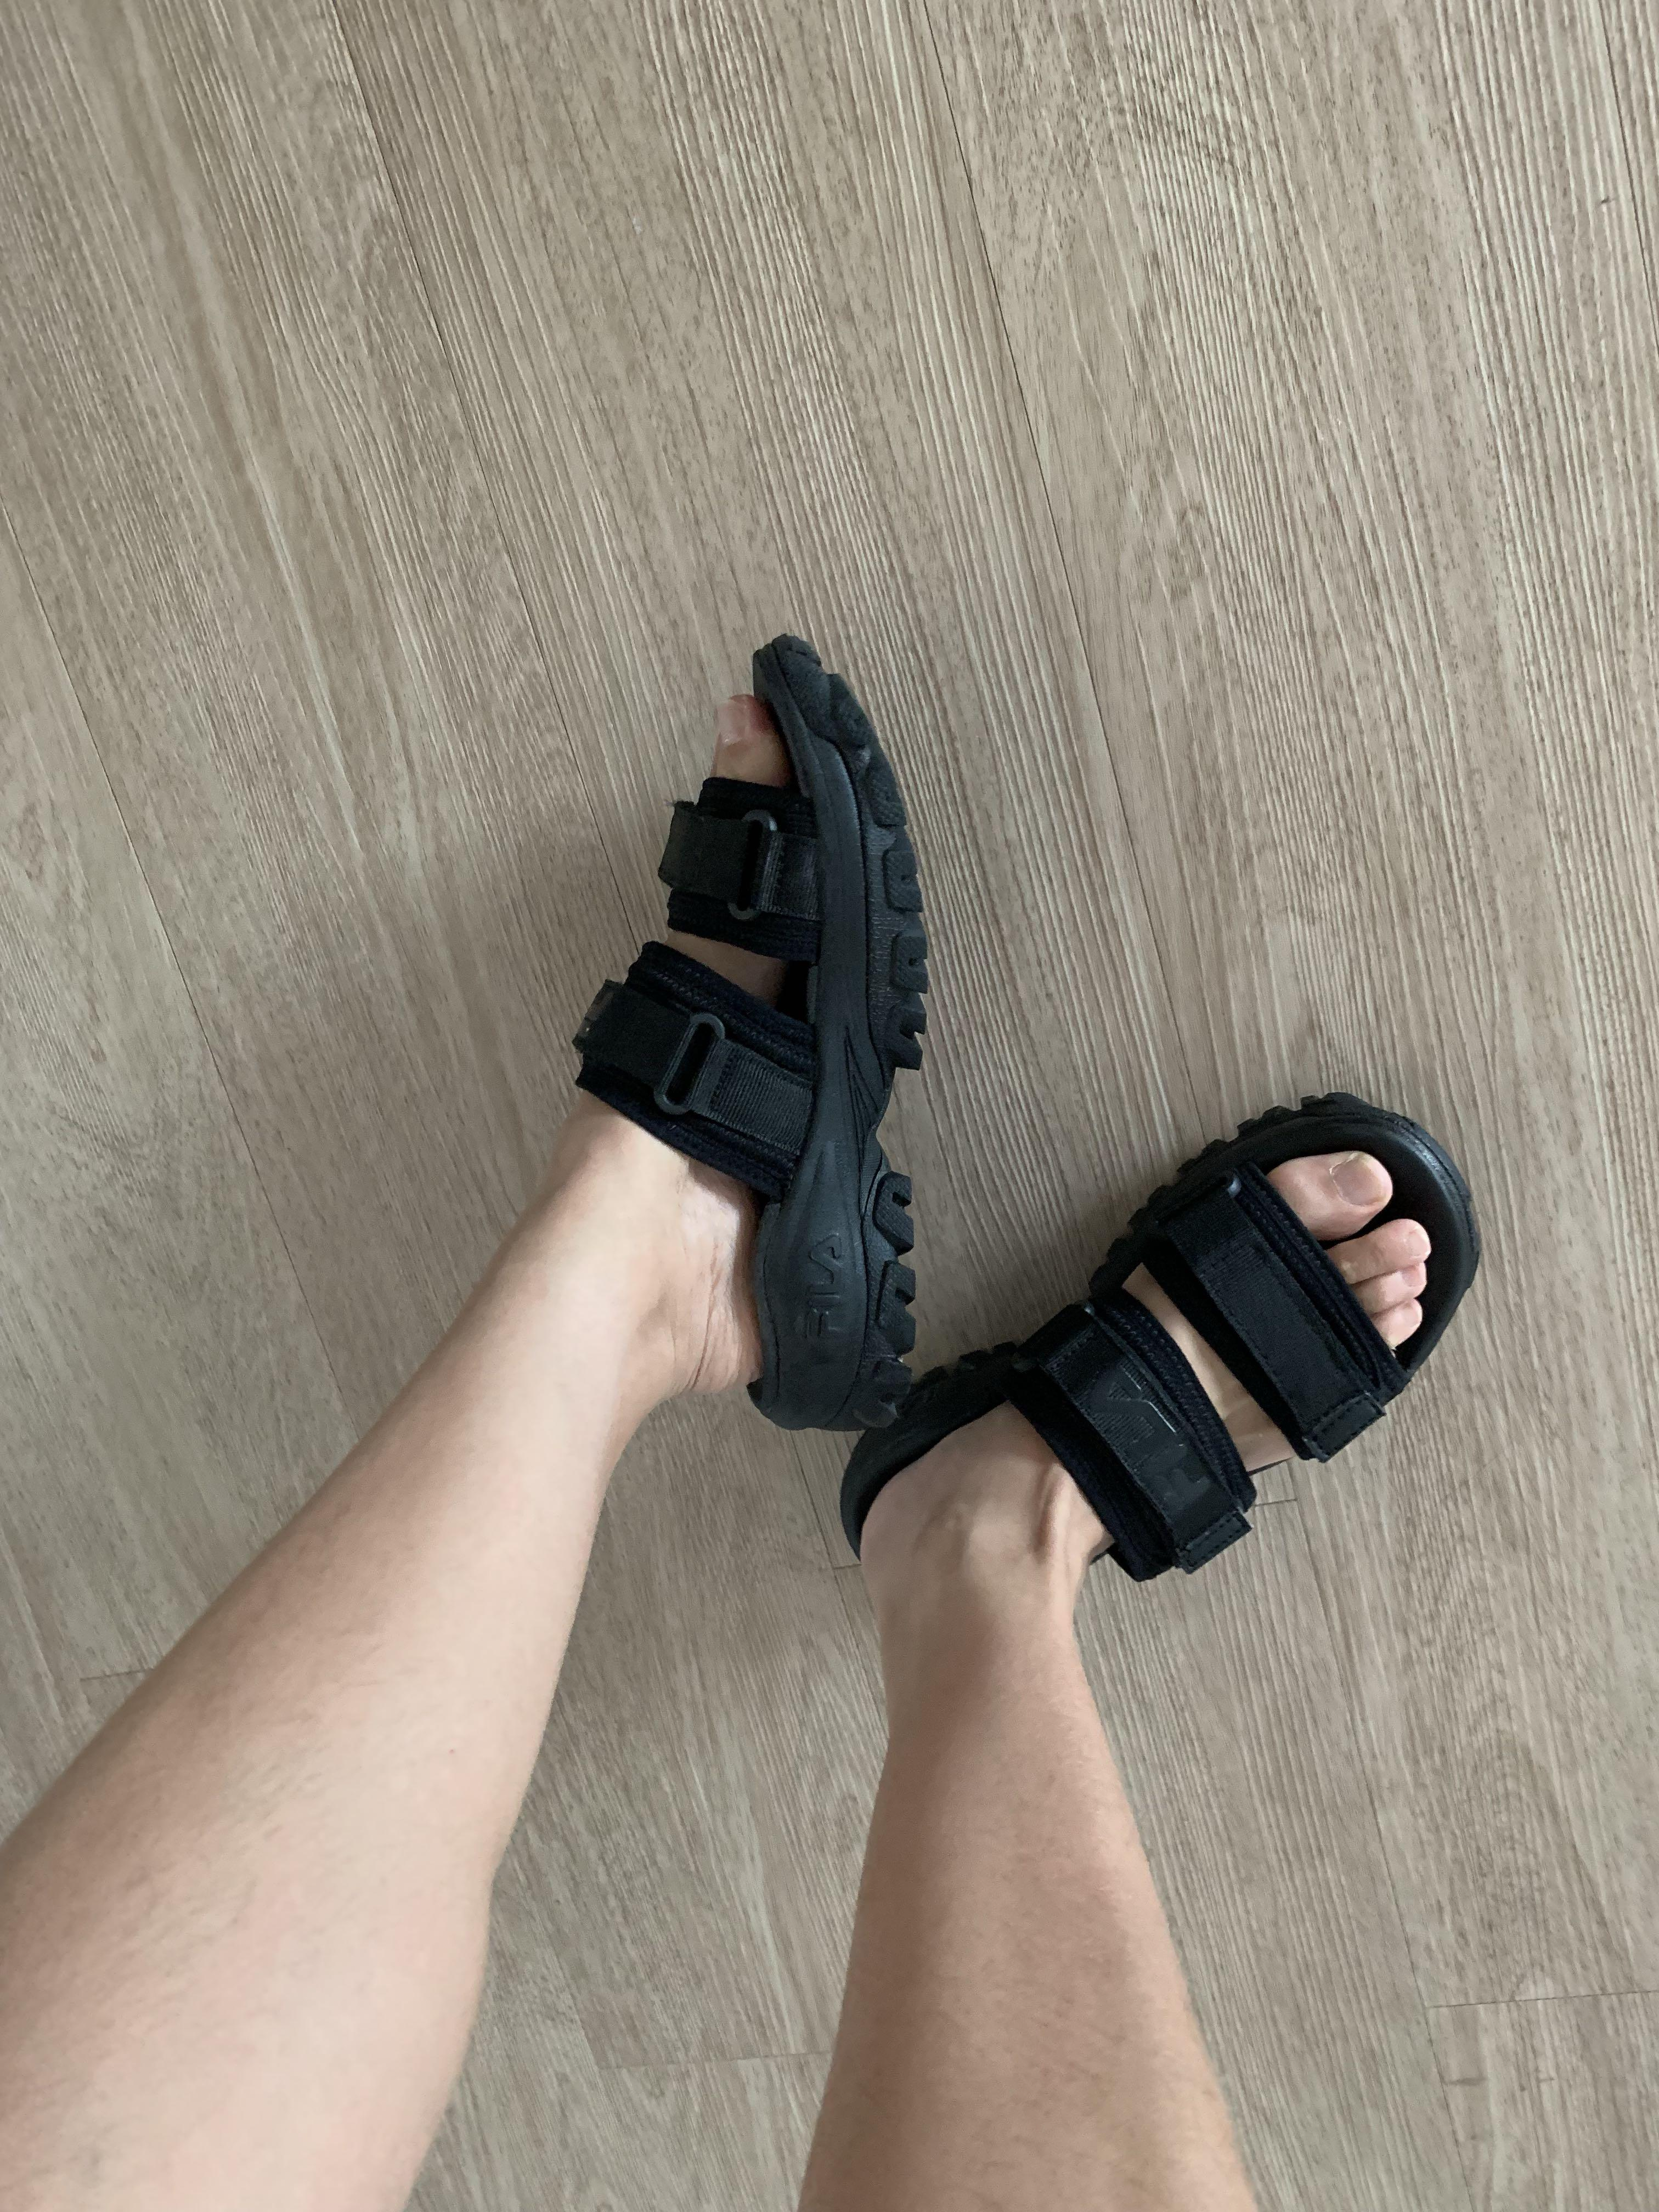 FILA Authentic Shoe From Korea